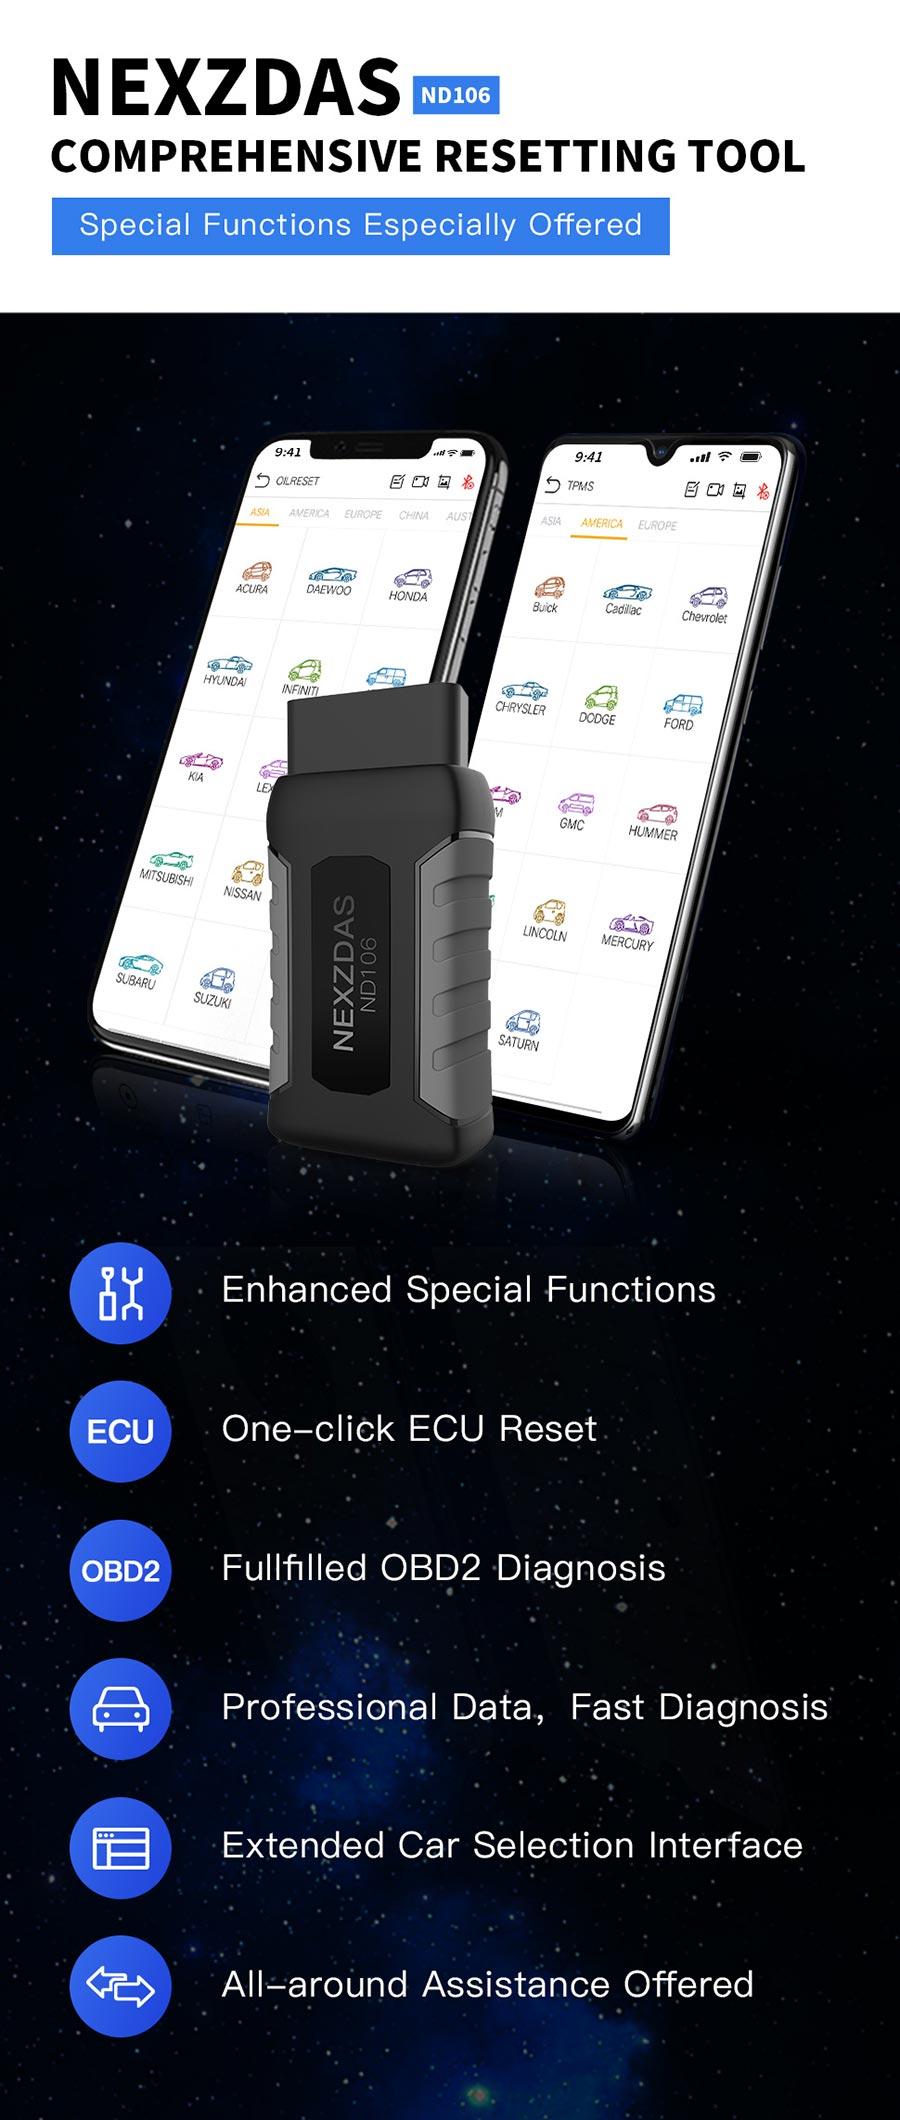 Humzor NexzDAS ND106 Bluetooth Special Function Resetting Tool